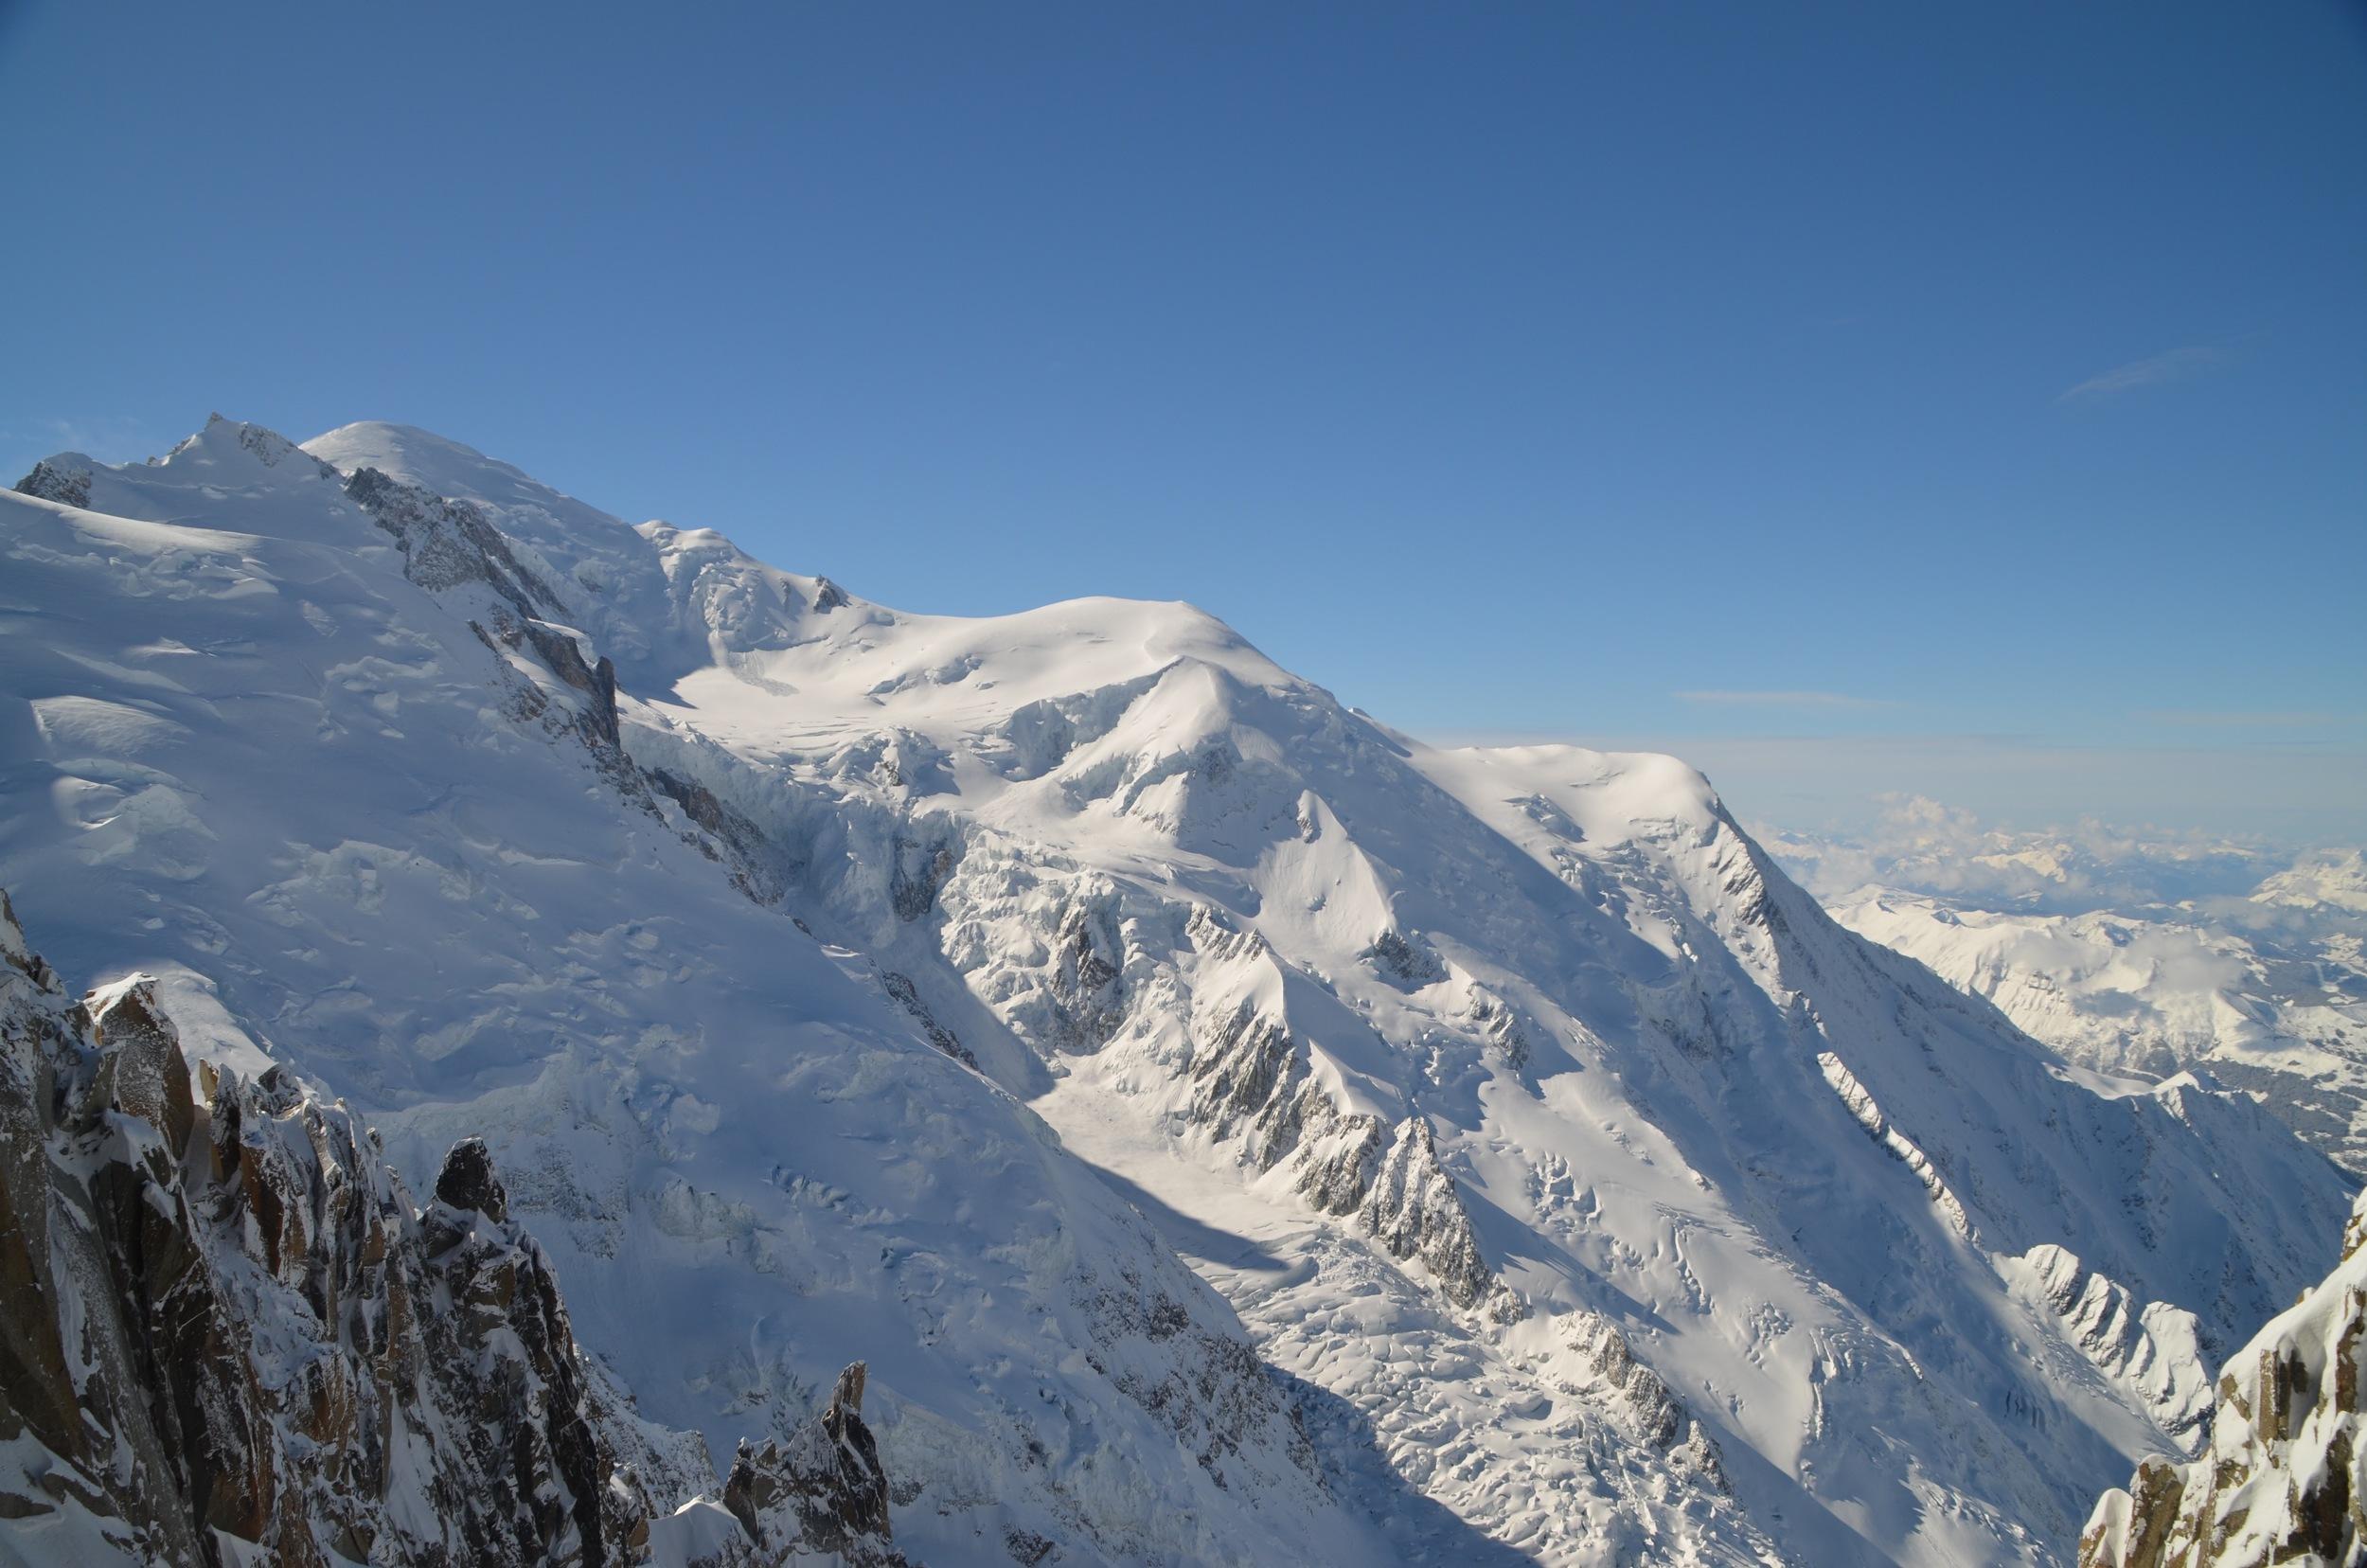 Mt. Blanc and the Tacul glacier